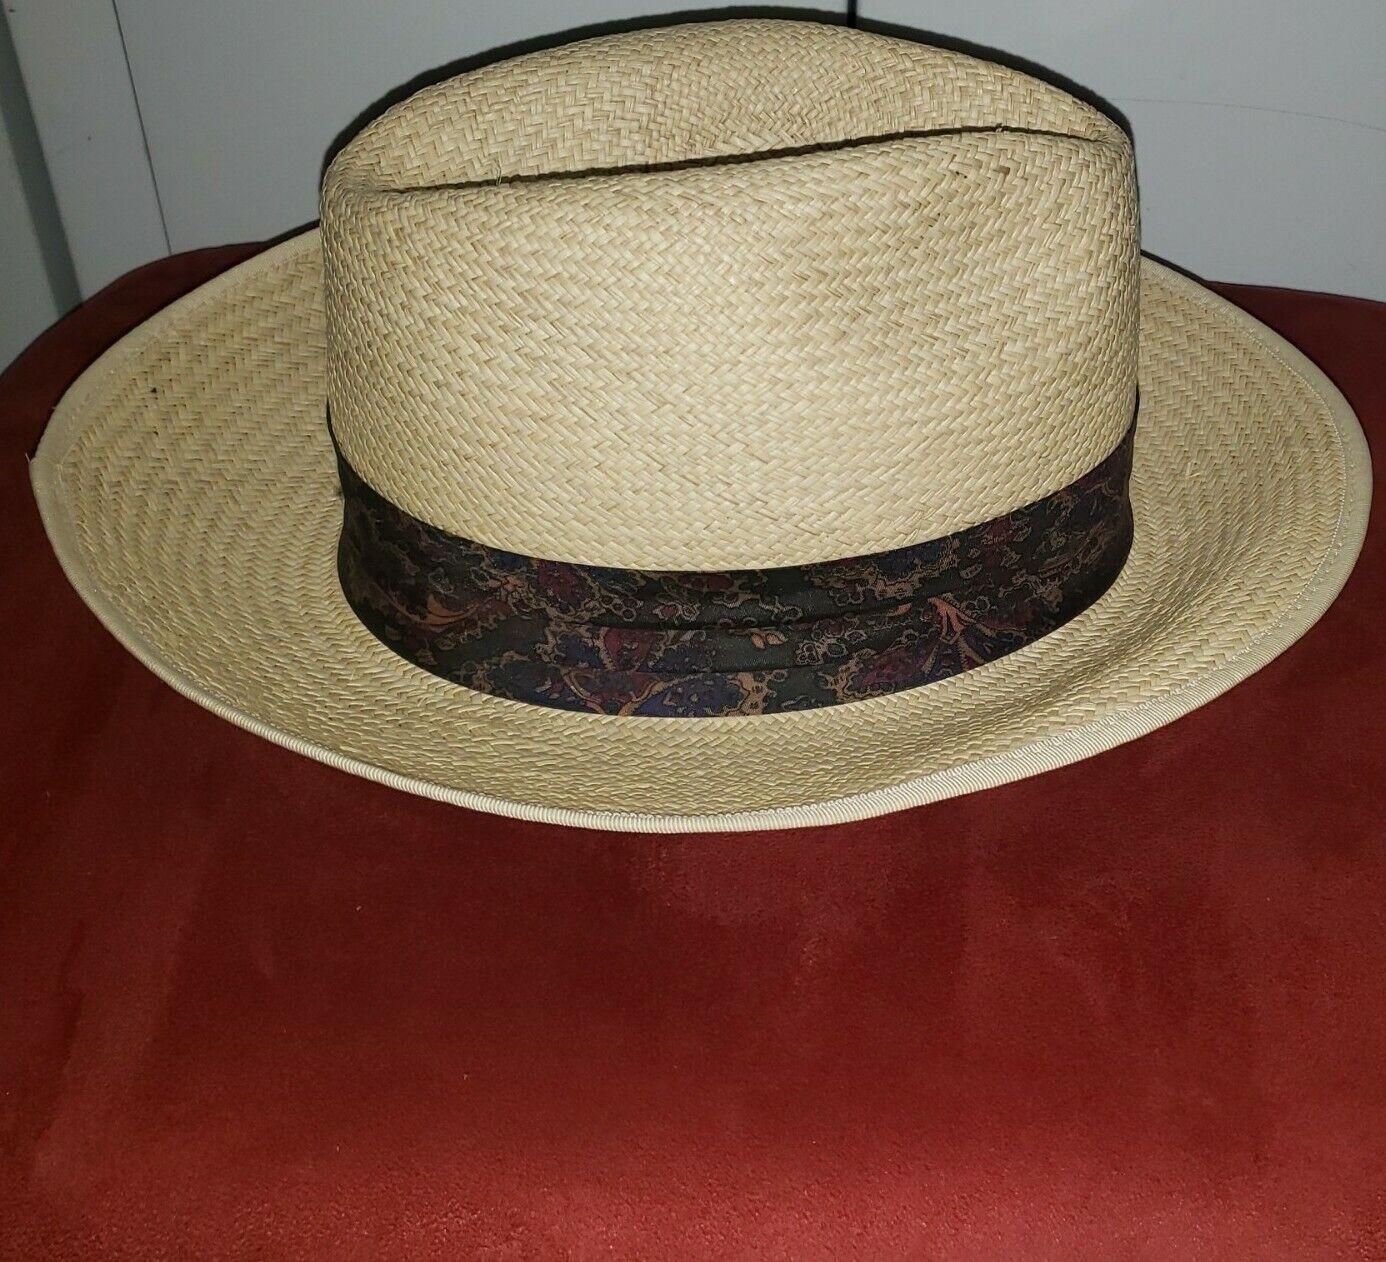 Vintage Kangol XL Straw Summer Hat - image 2